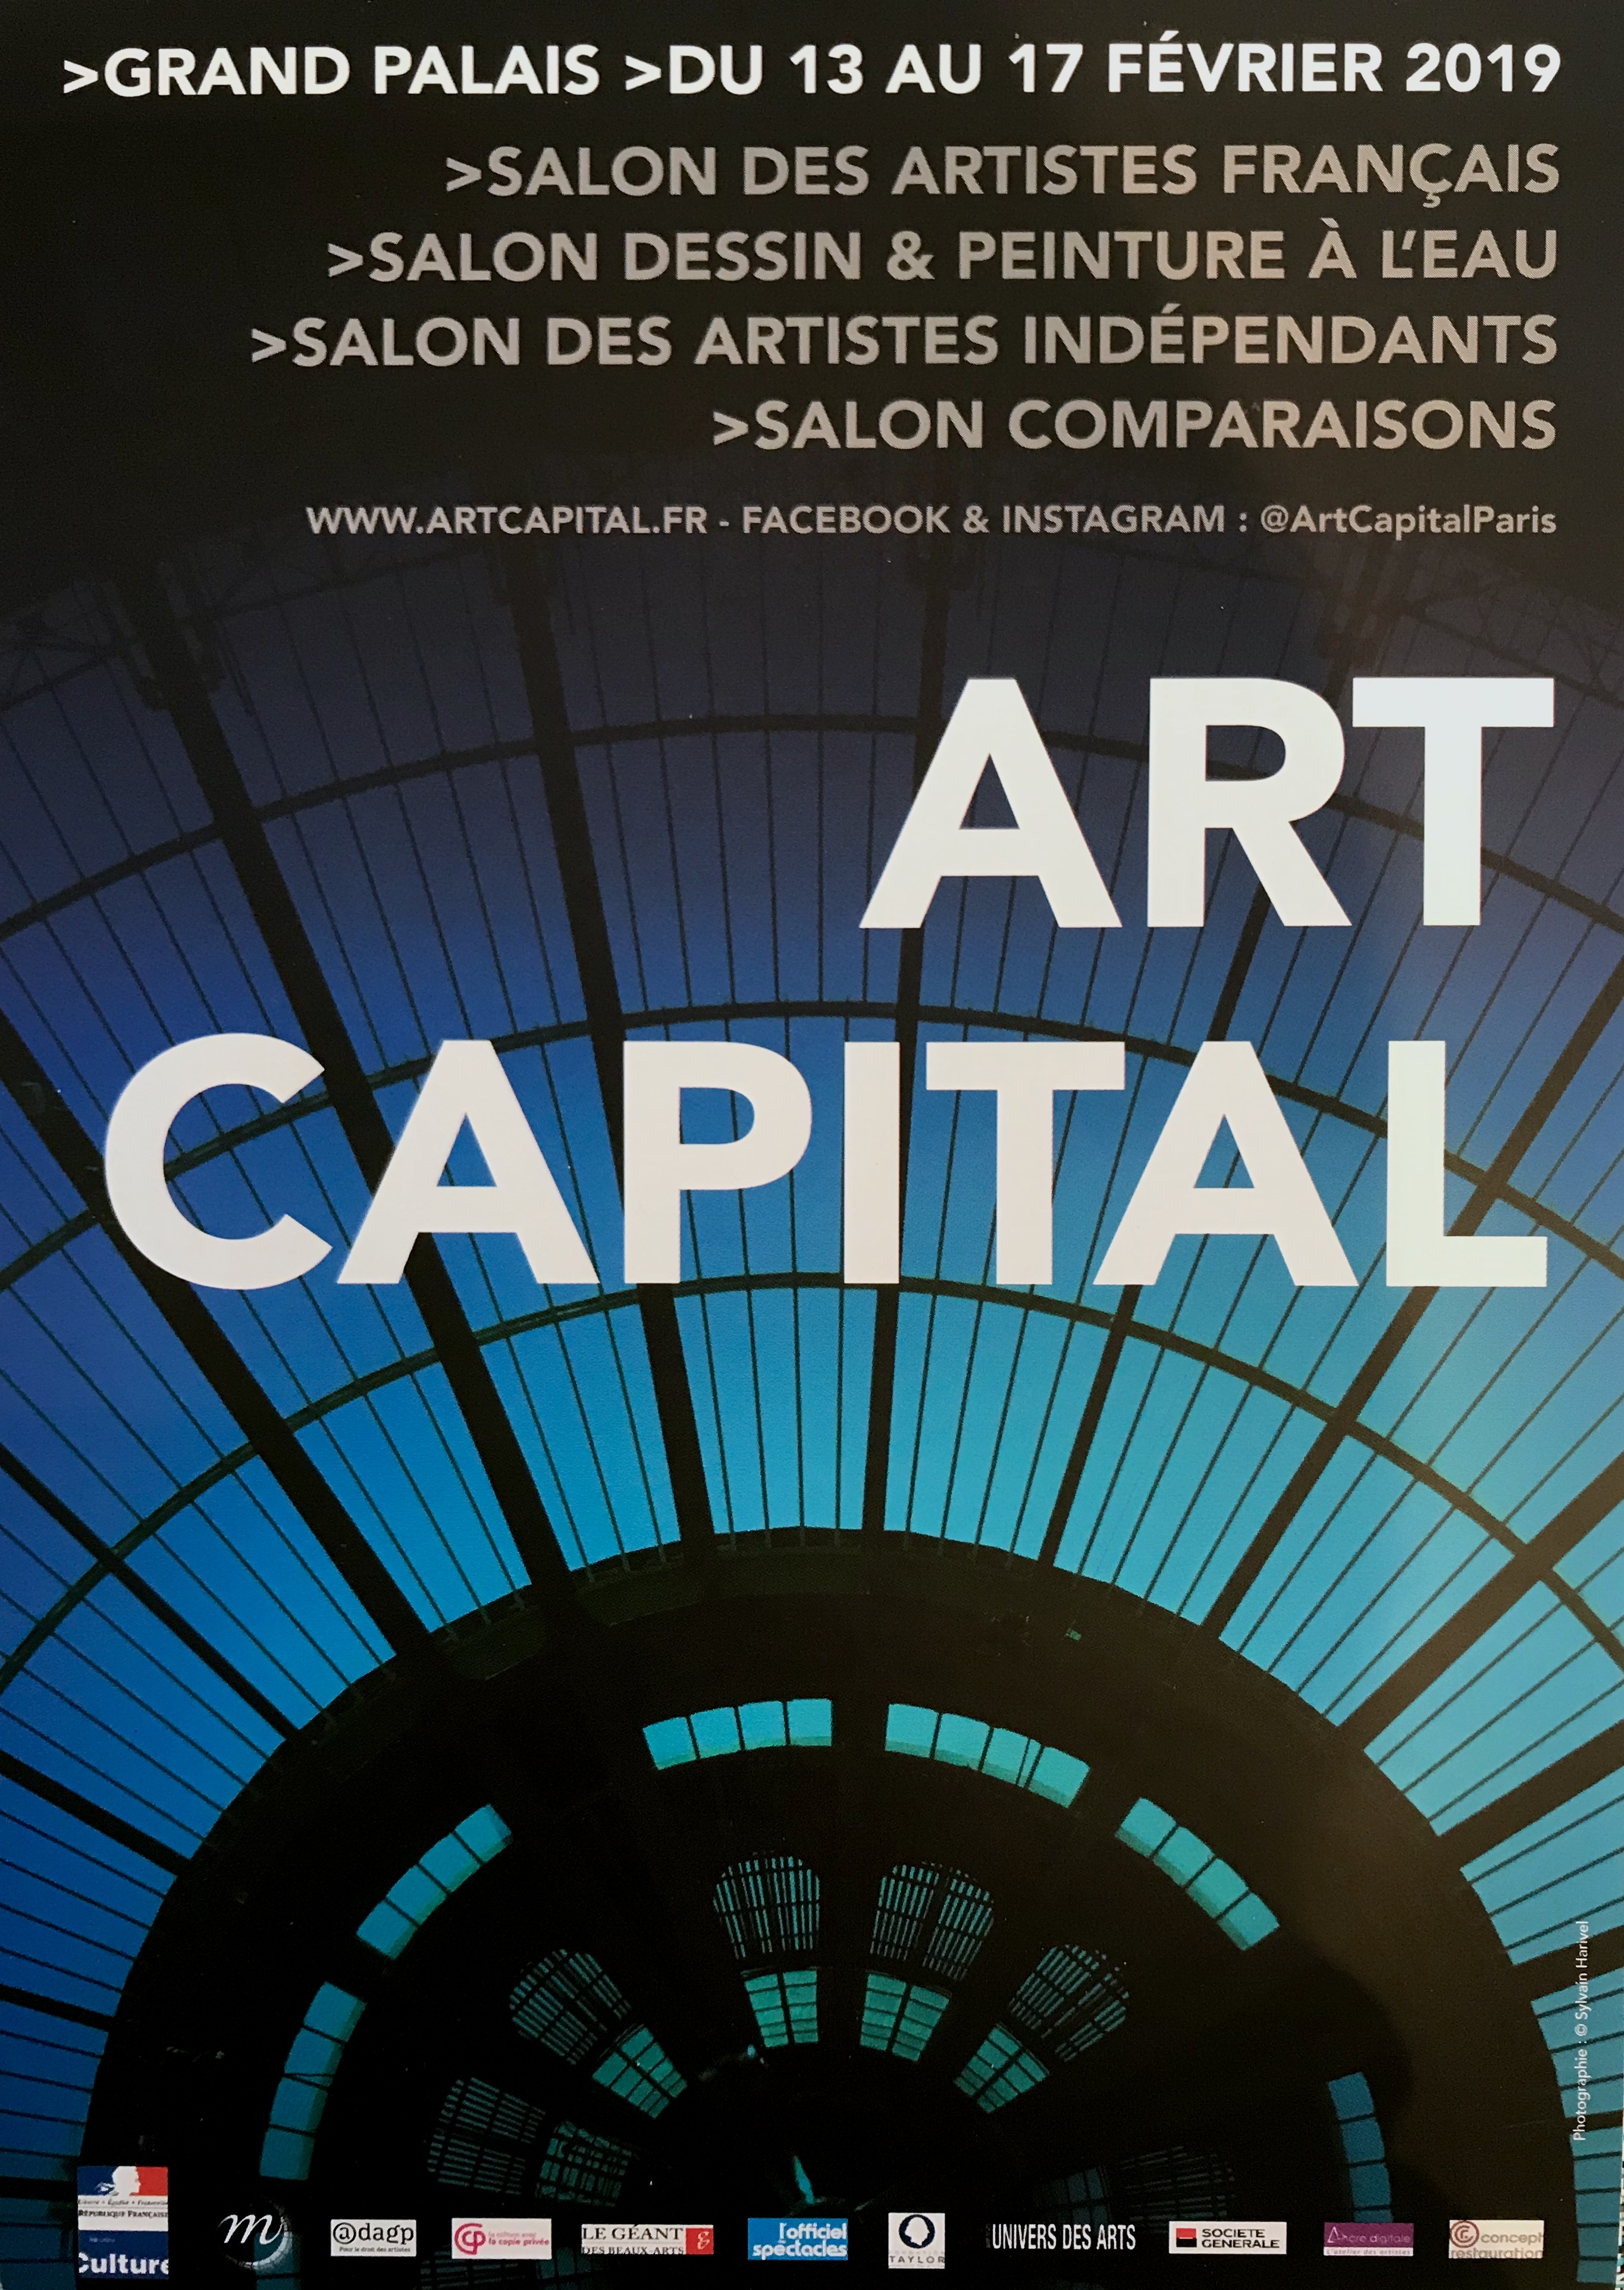 Art capital 2019